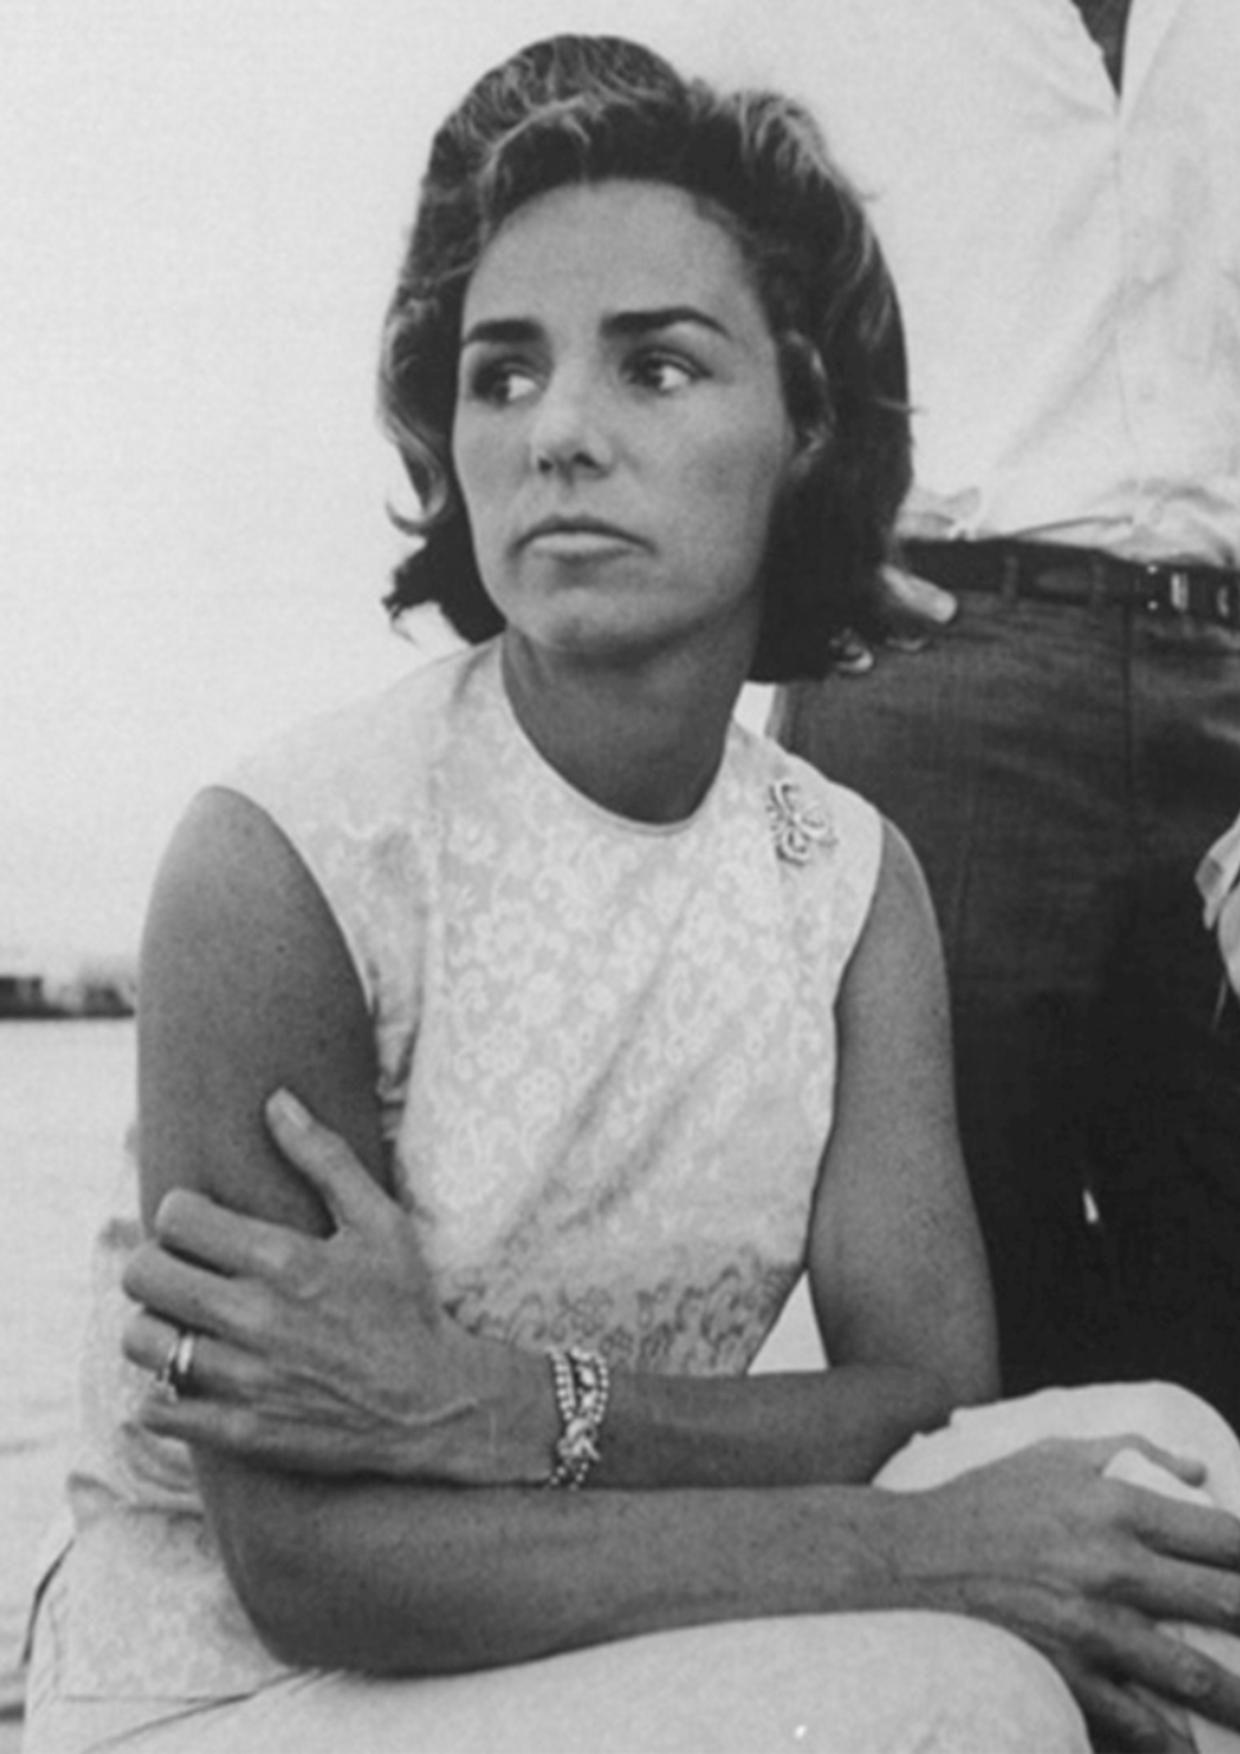 Cheryl Kennedy (born 1947) Cheryl Kennedy (born 1947) new picture